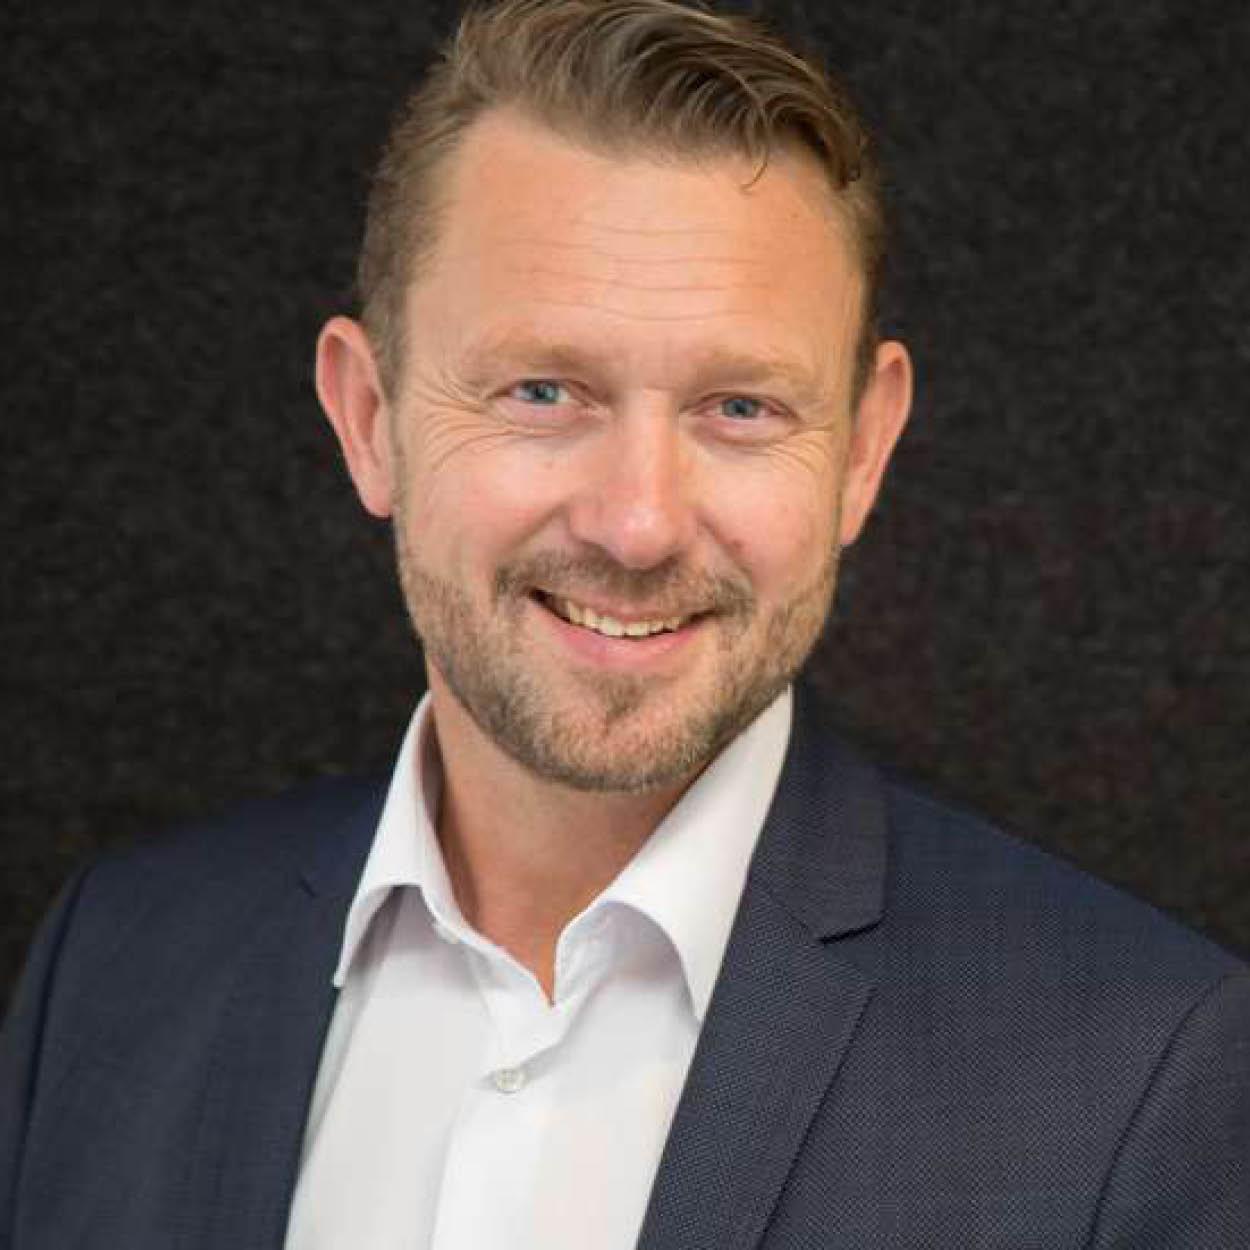 Petter Leon Fauske i MMC First Process